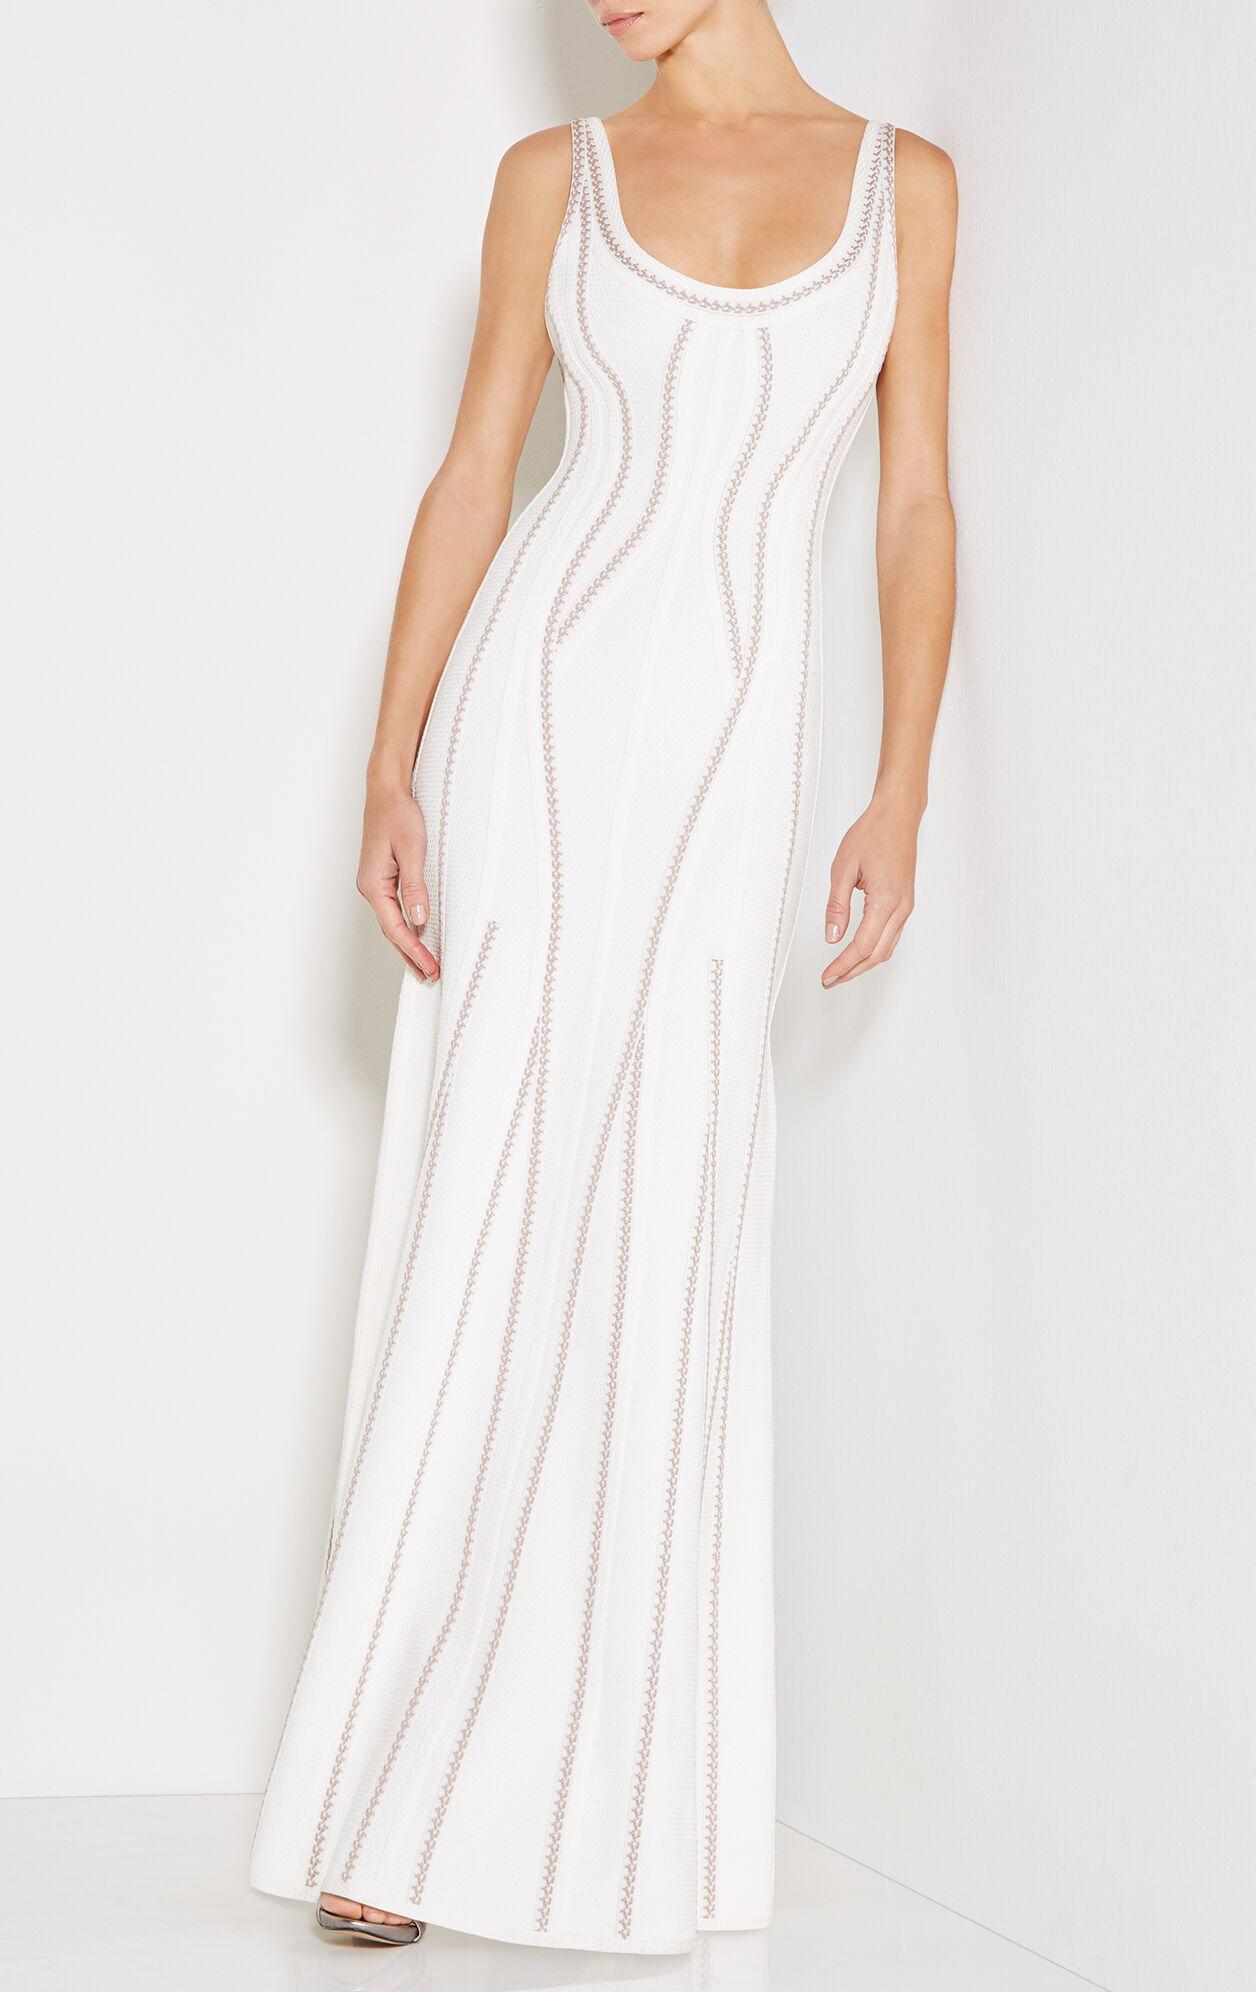 Luisana Texture Bandage Mermaid Gown